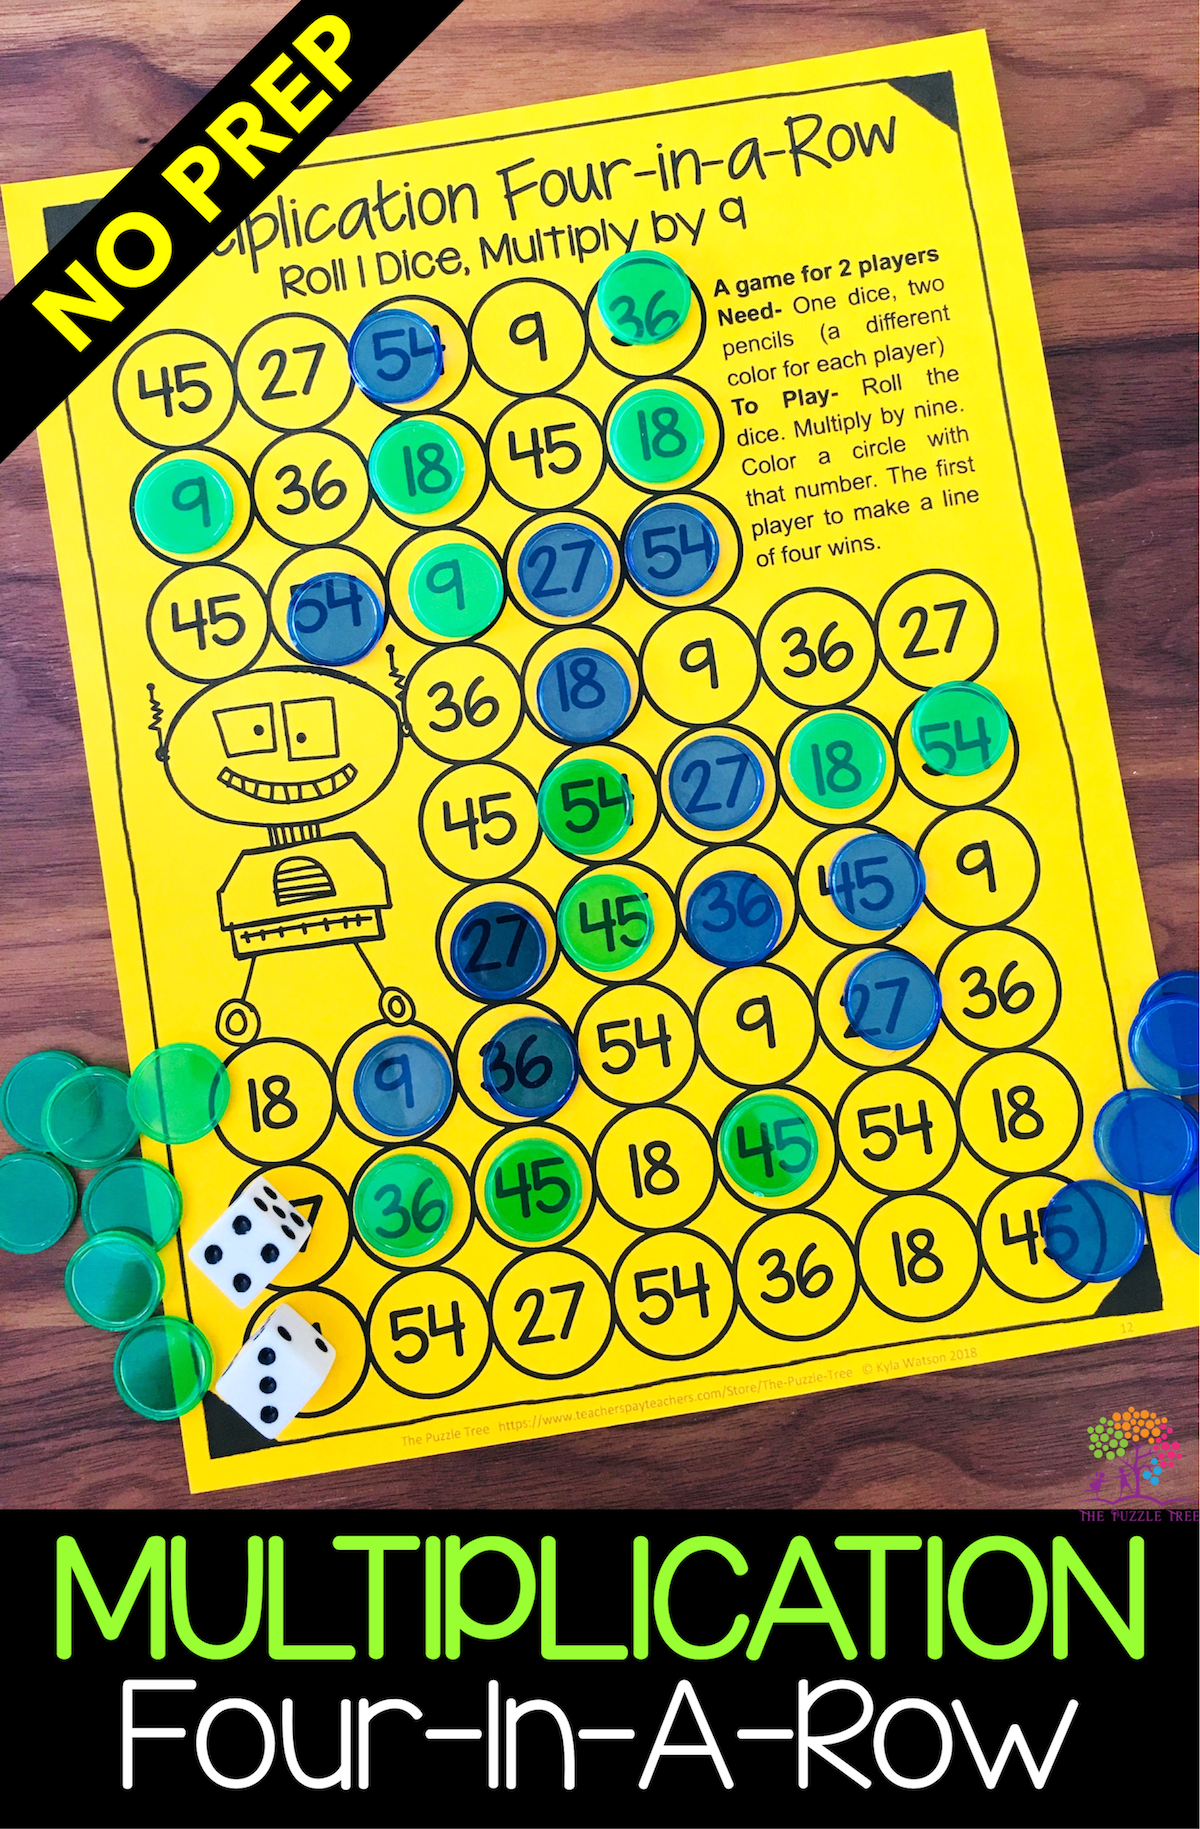 Multiplication Games Printable FourinaRow Math Games